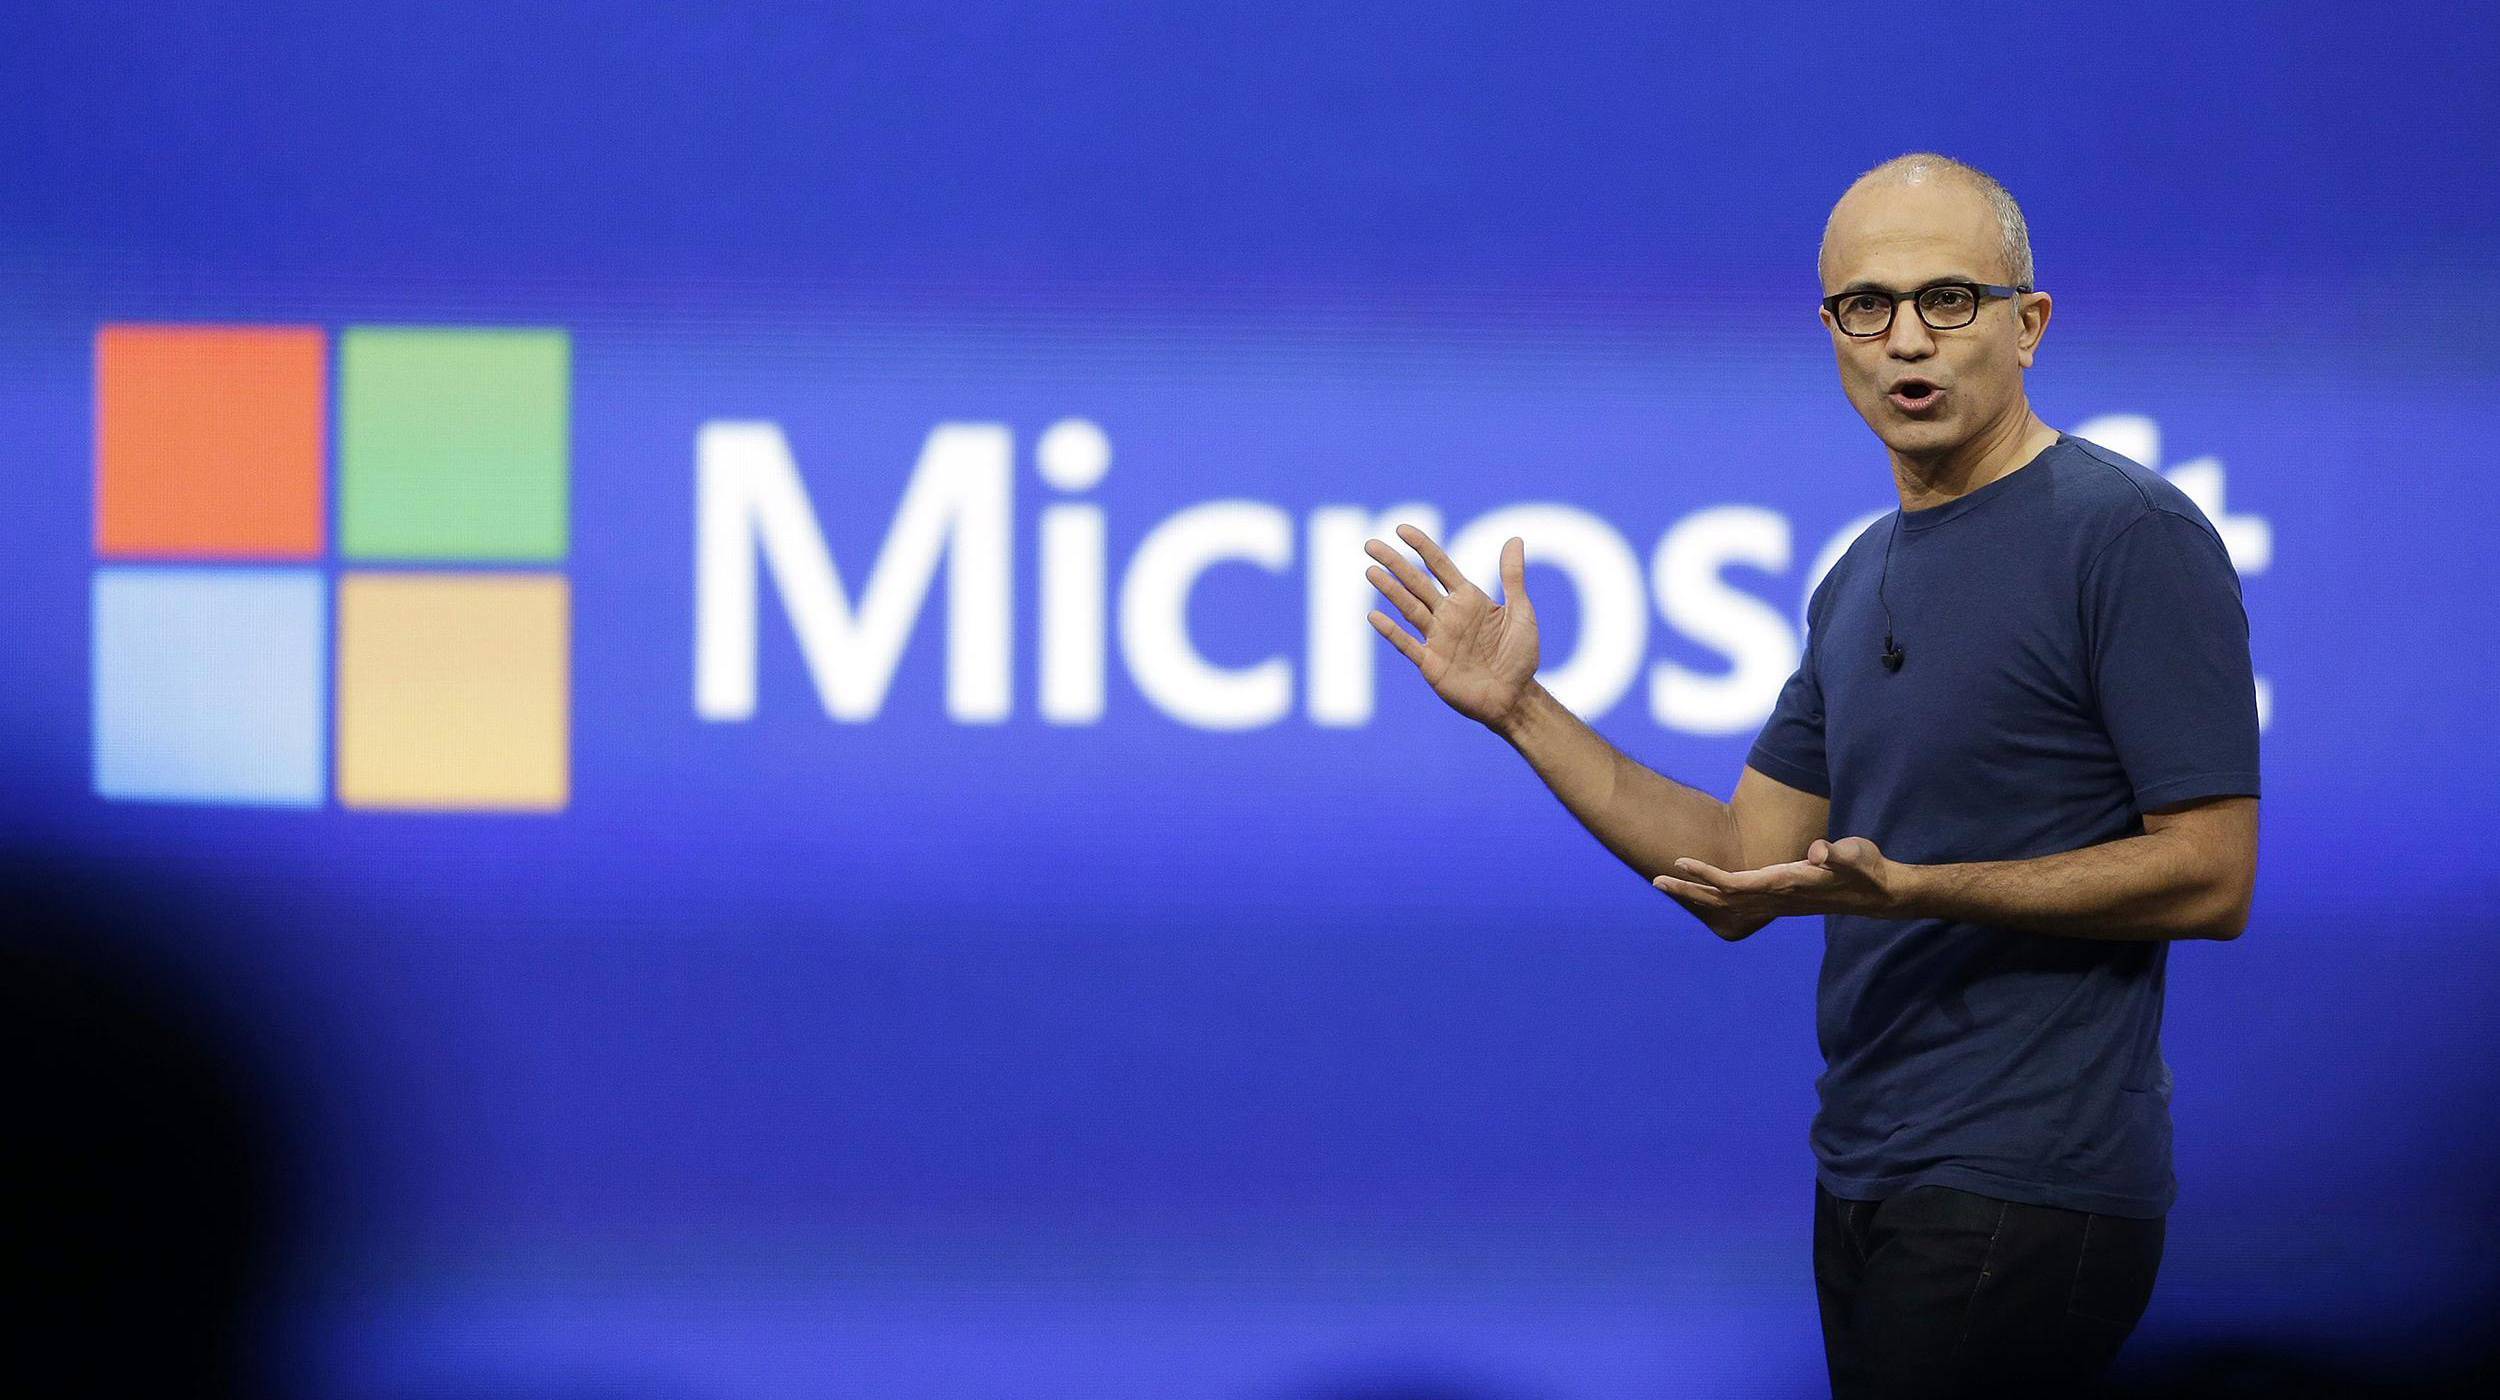 Microsoft CEO, Satya Nadella to join Starbucks Board of Directors